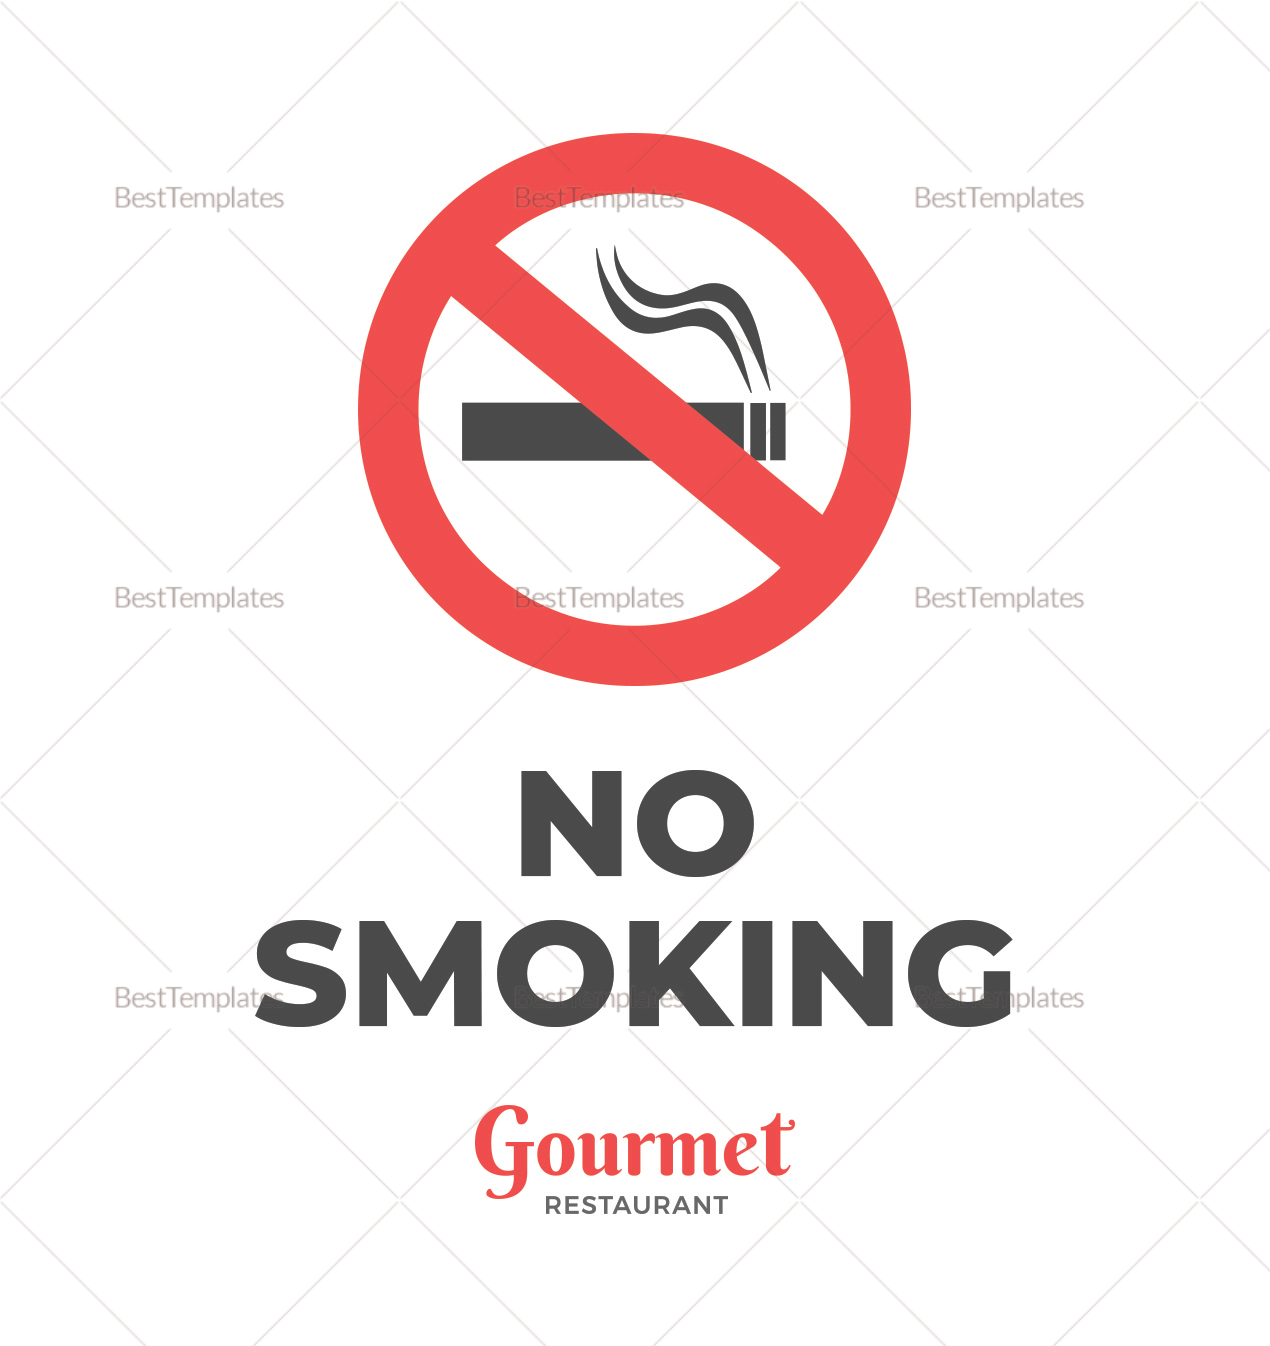 Restaurant No Smoking Sign Template